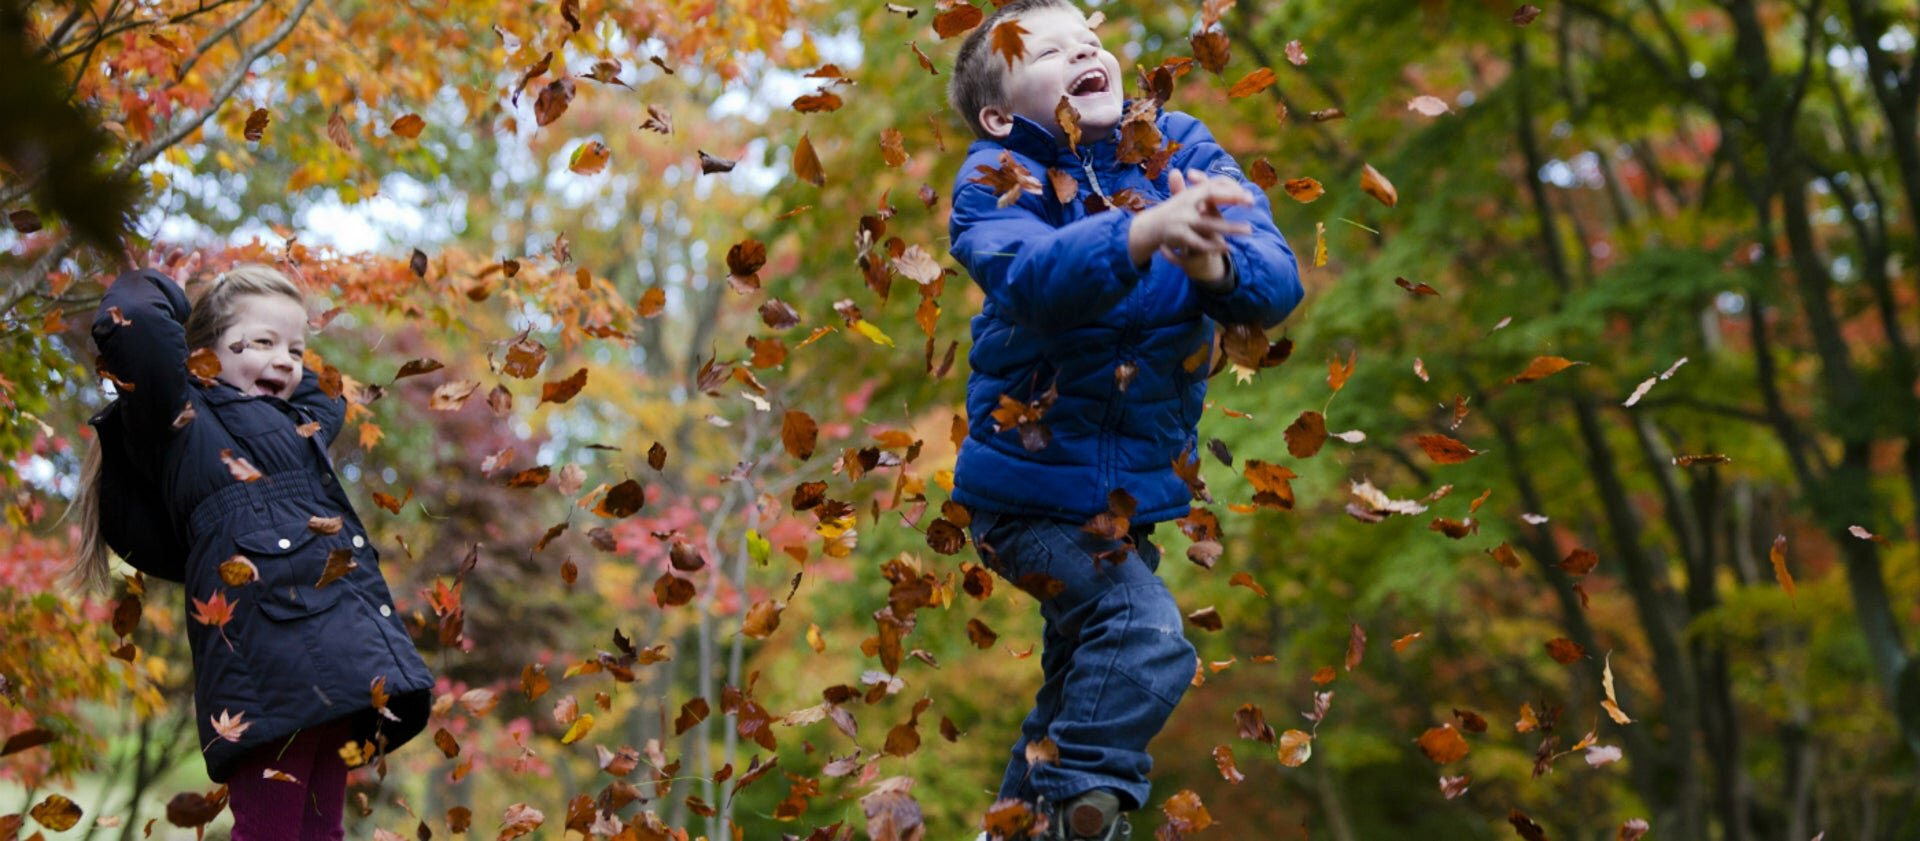 autumnleavesplayingbodnant1040507megantaylor.jpg